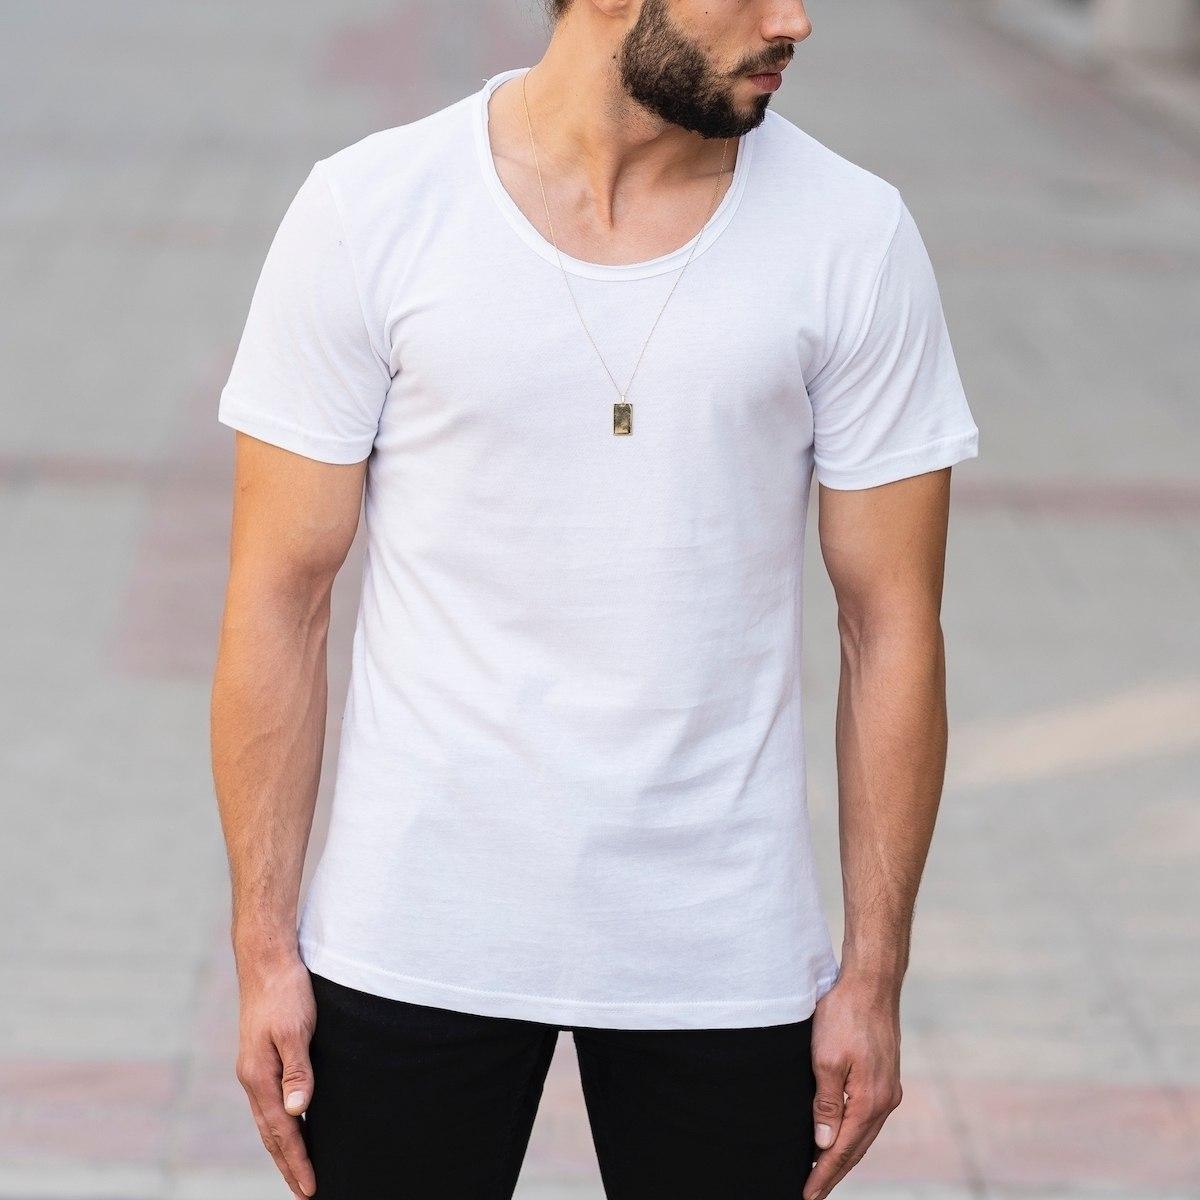 Croped Collar White T-Shirt